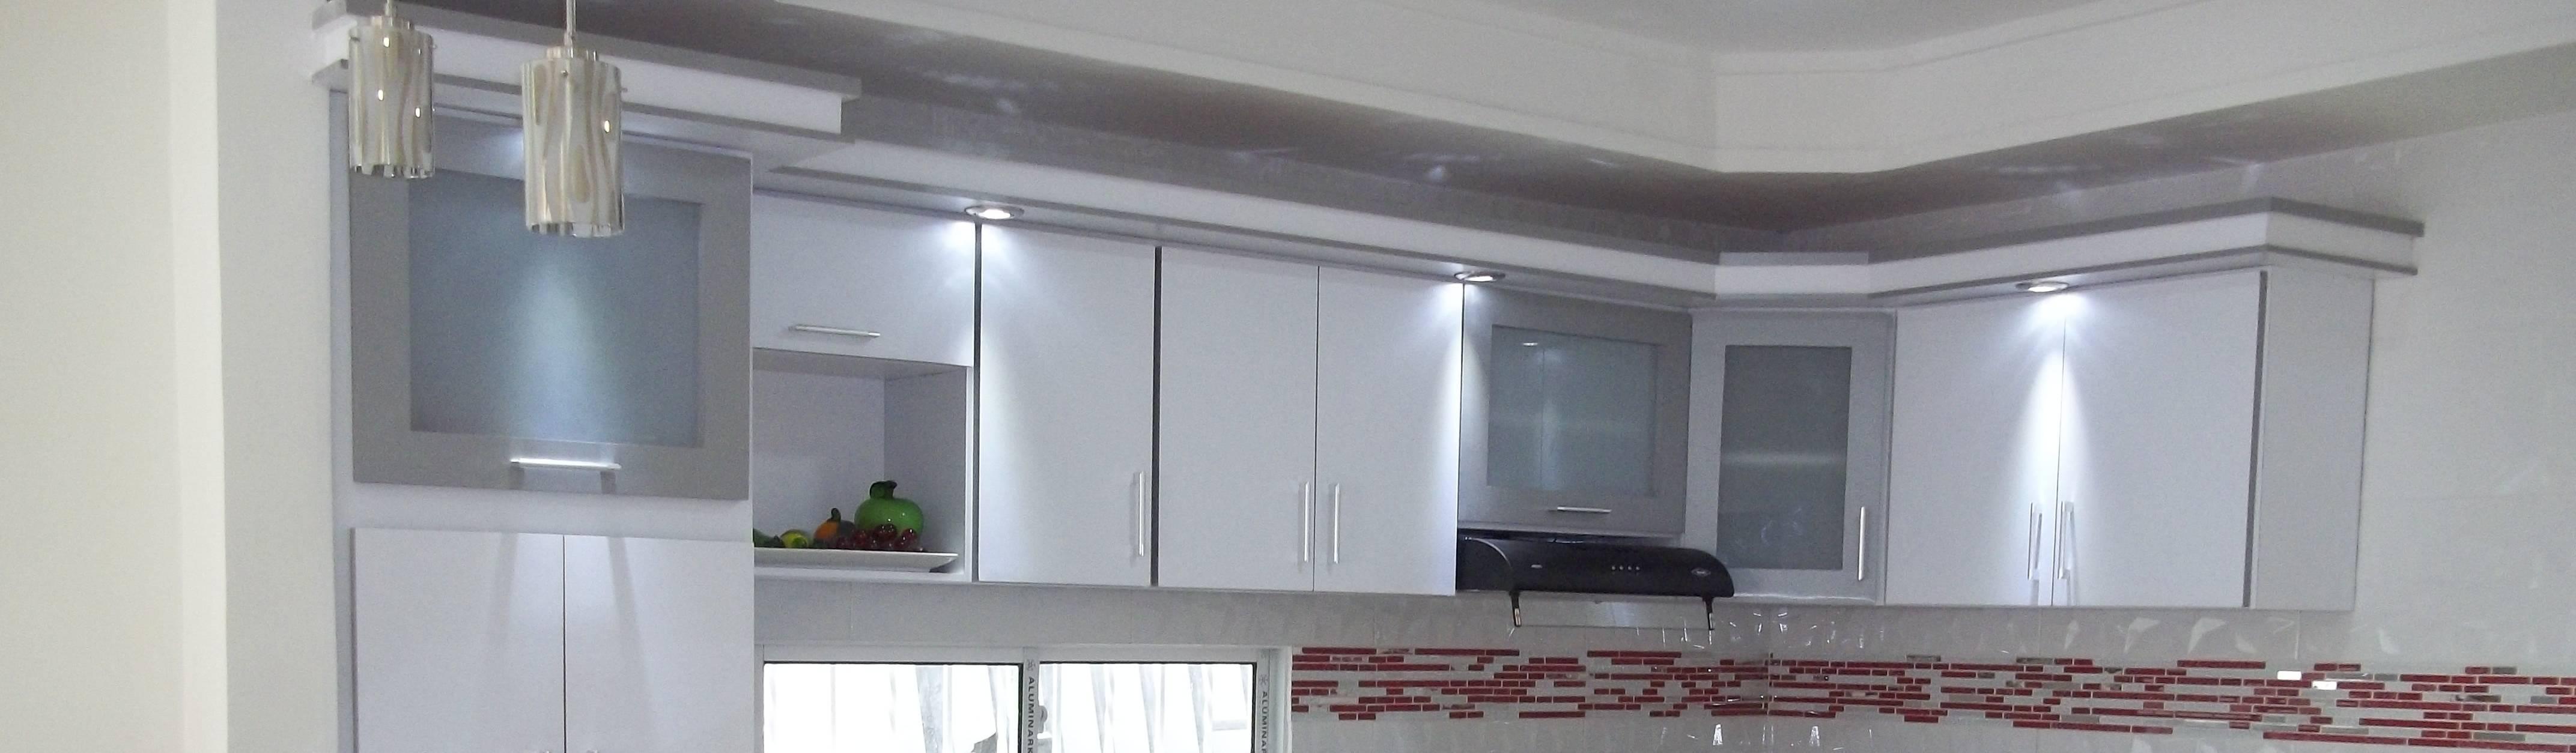 Cocinas integrales modernas en barranquilla by for Cocinas barranquilla